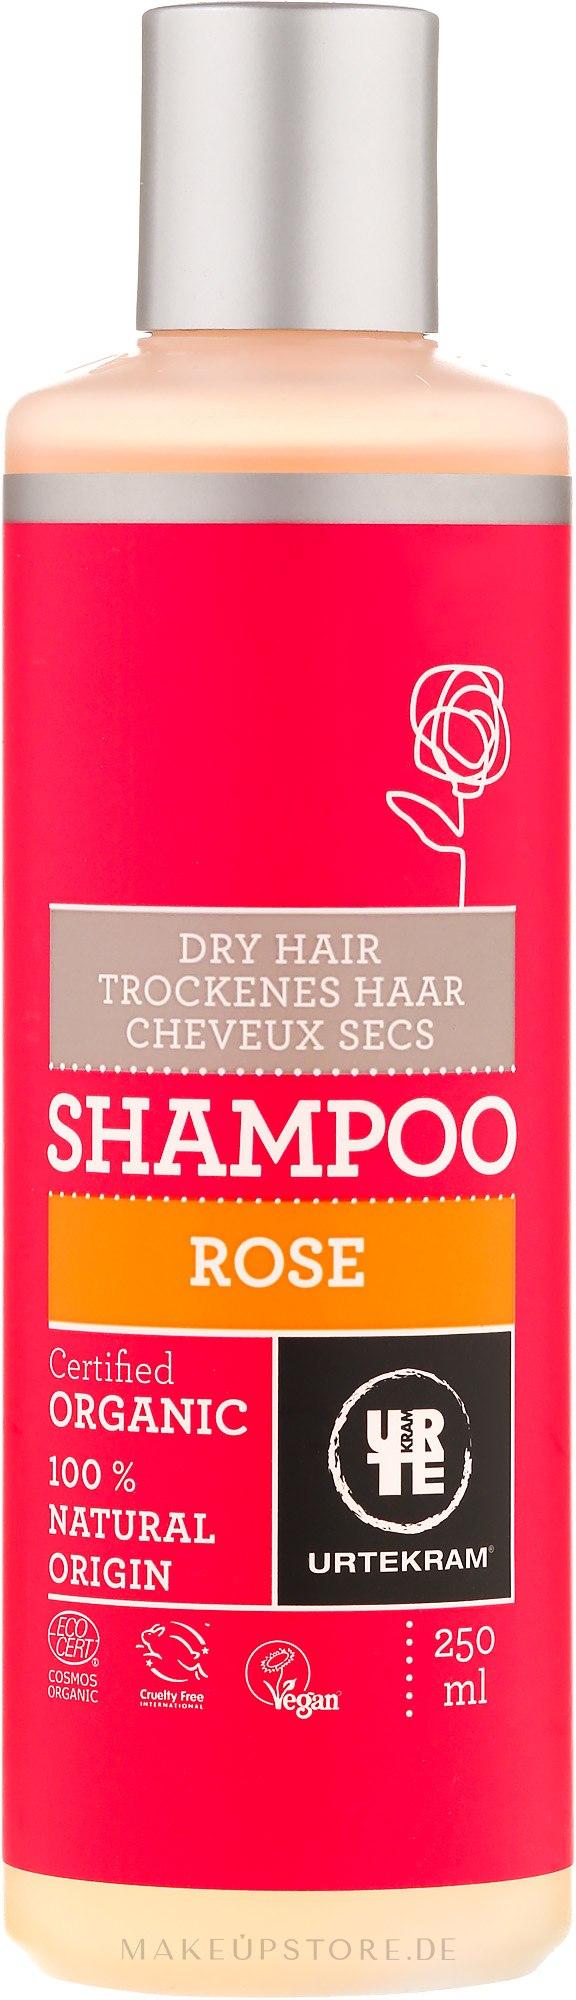 "Shampoo für trockenes Haar ""Rose"" - Urtekram Rose Dry Hair Shampoo — Bild 250 ml"